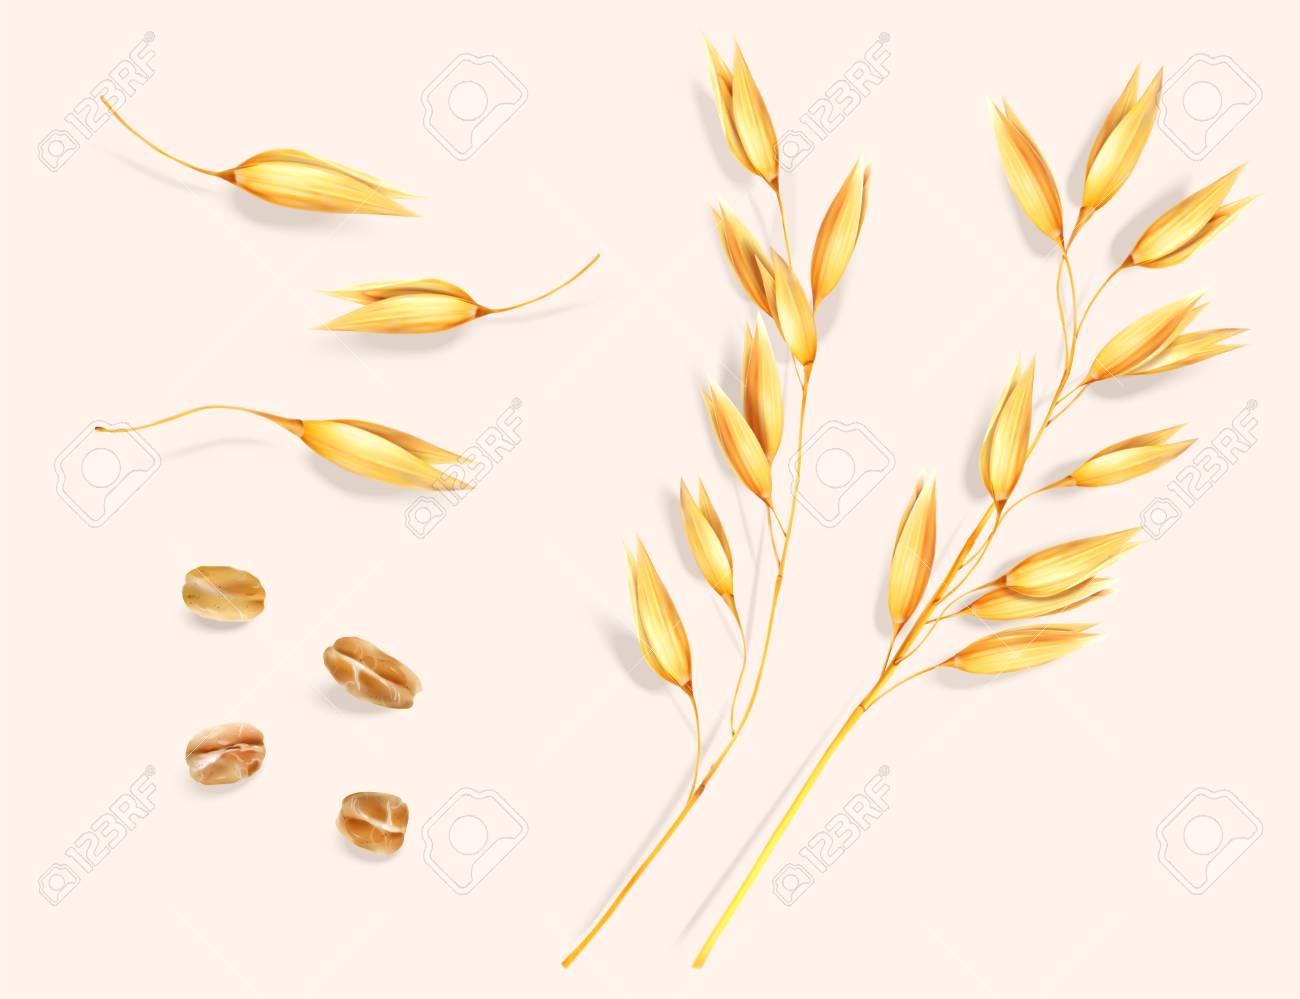 Wheat ear and grain elements - 119210223